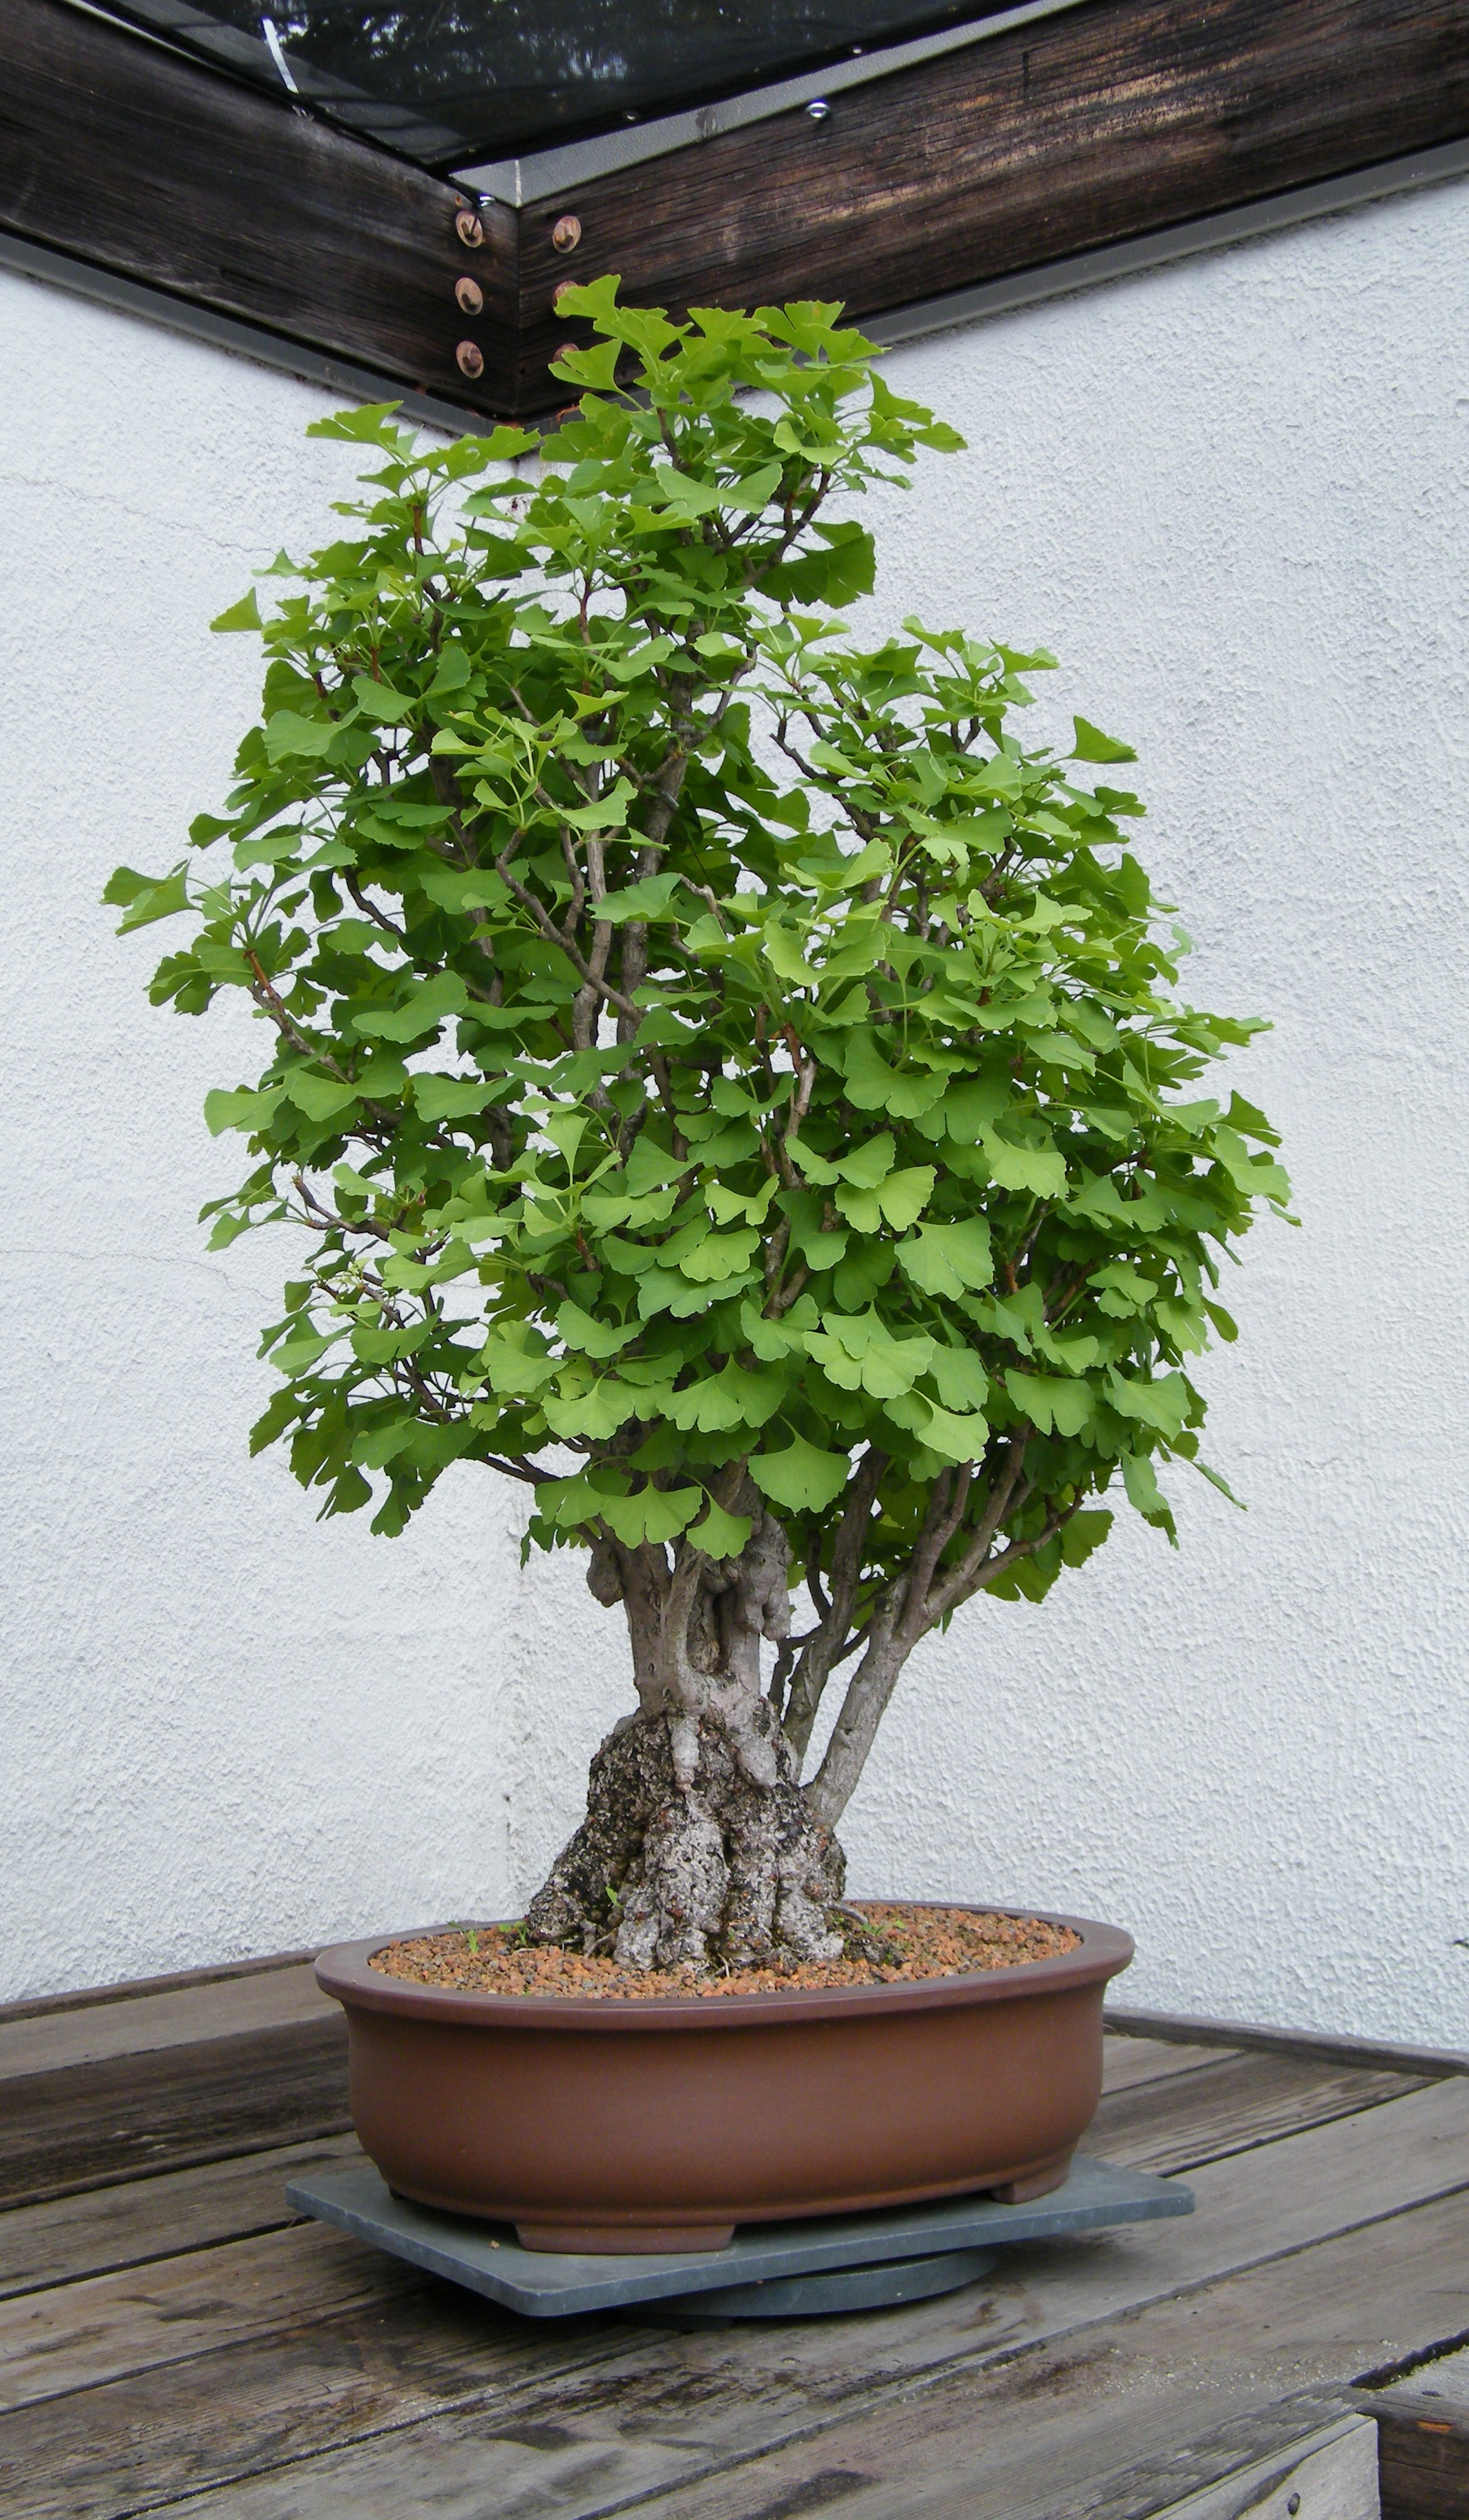 file ginkgo bonsai national bonsai penjing museum. Black Bedroom Furniture Sets. Home Design Ideas